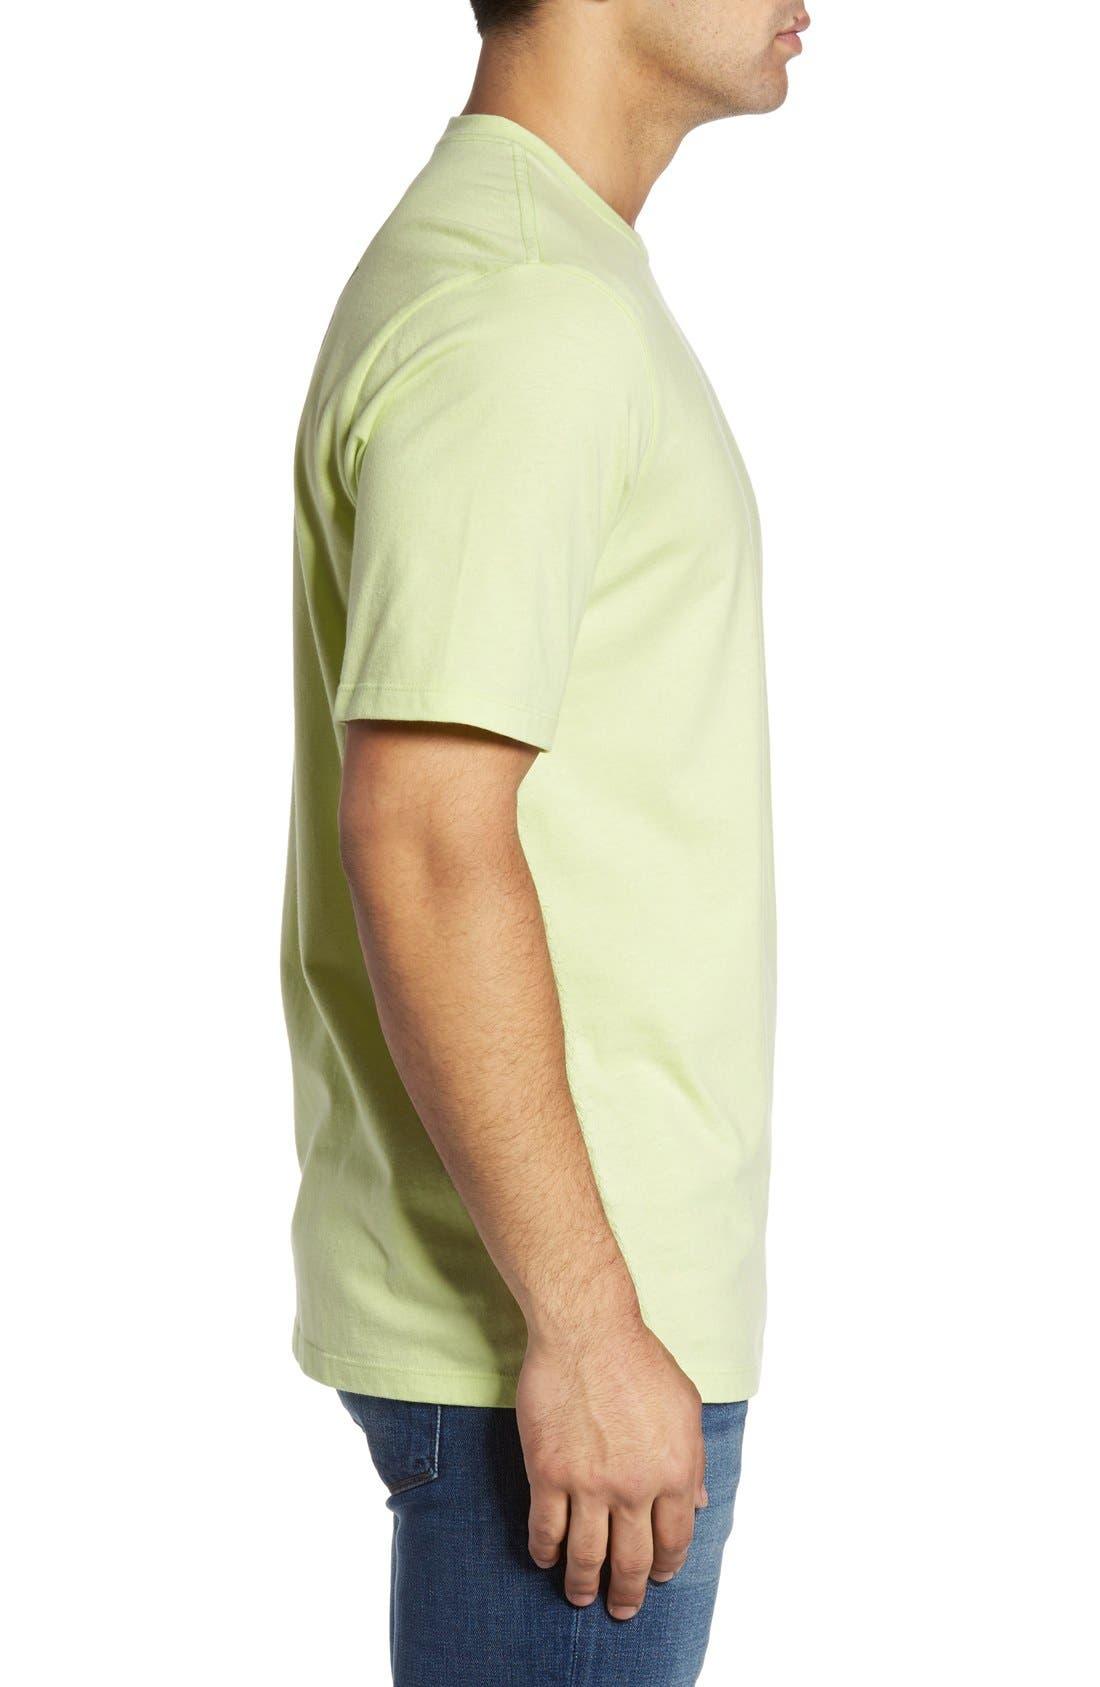 Alternate Image 3  - Tommy Bahama Keeping It Rio Graphic T-Shirt (Big & Tall)